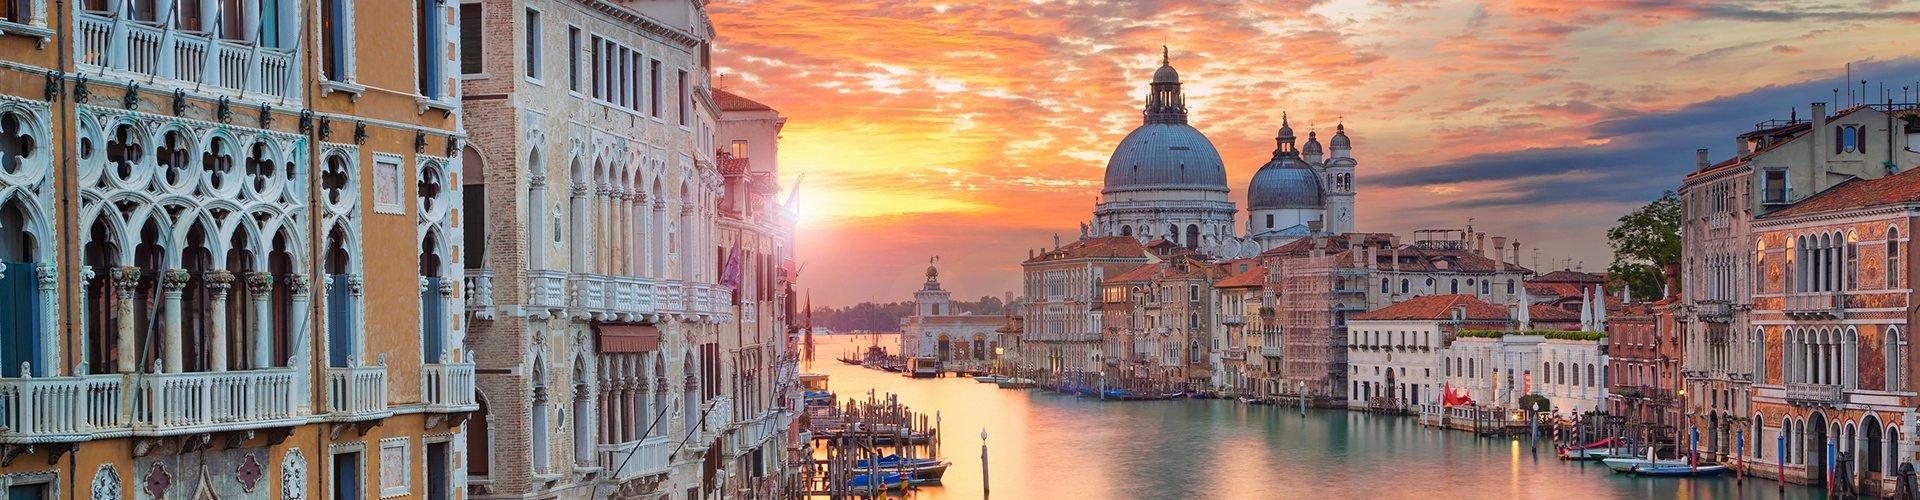 Familienurlaub in Venetien